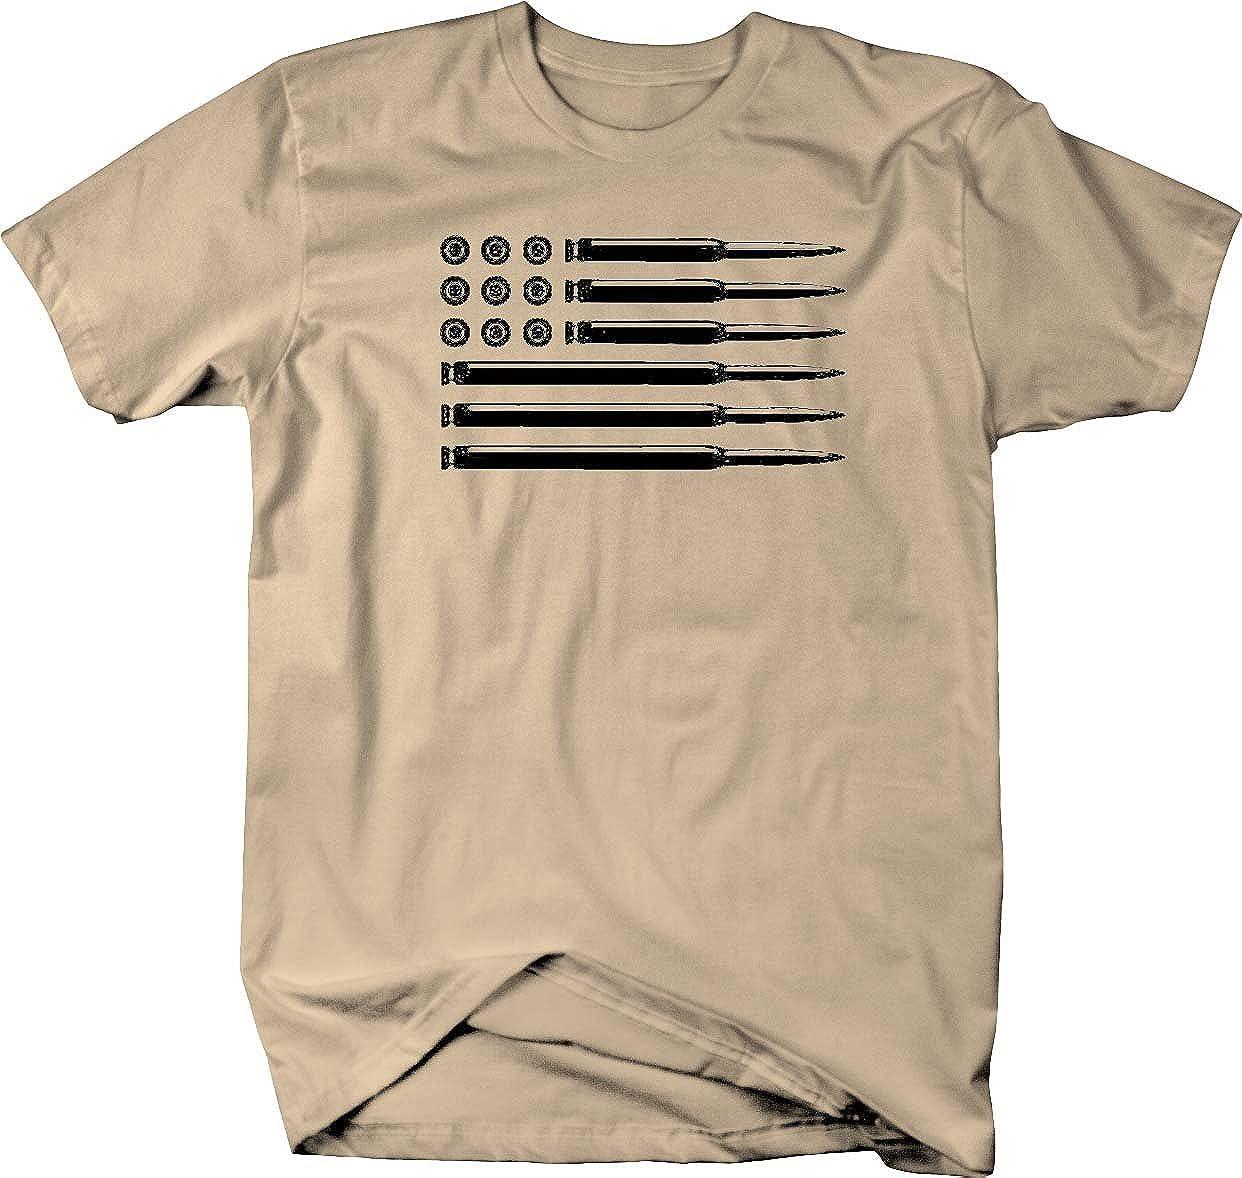 AR15 556 Rifle Bullets American Flag Gun Rights Military Mens T Shirt-Vaci